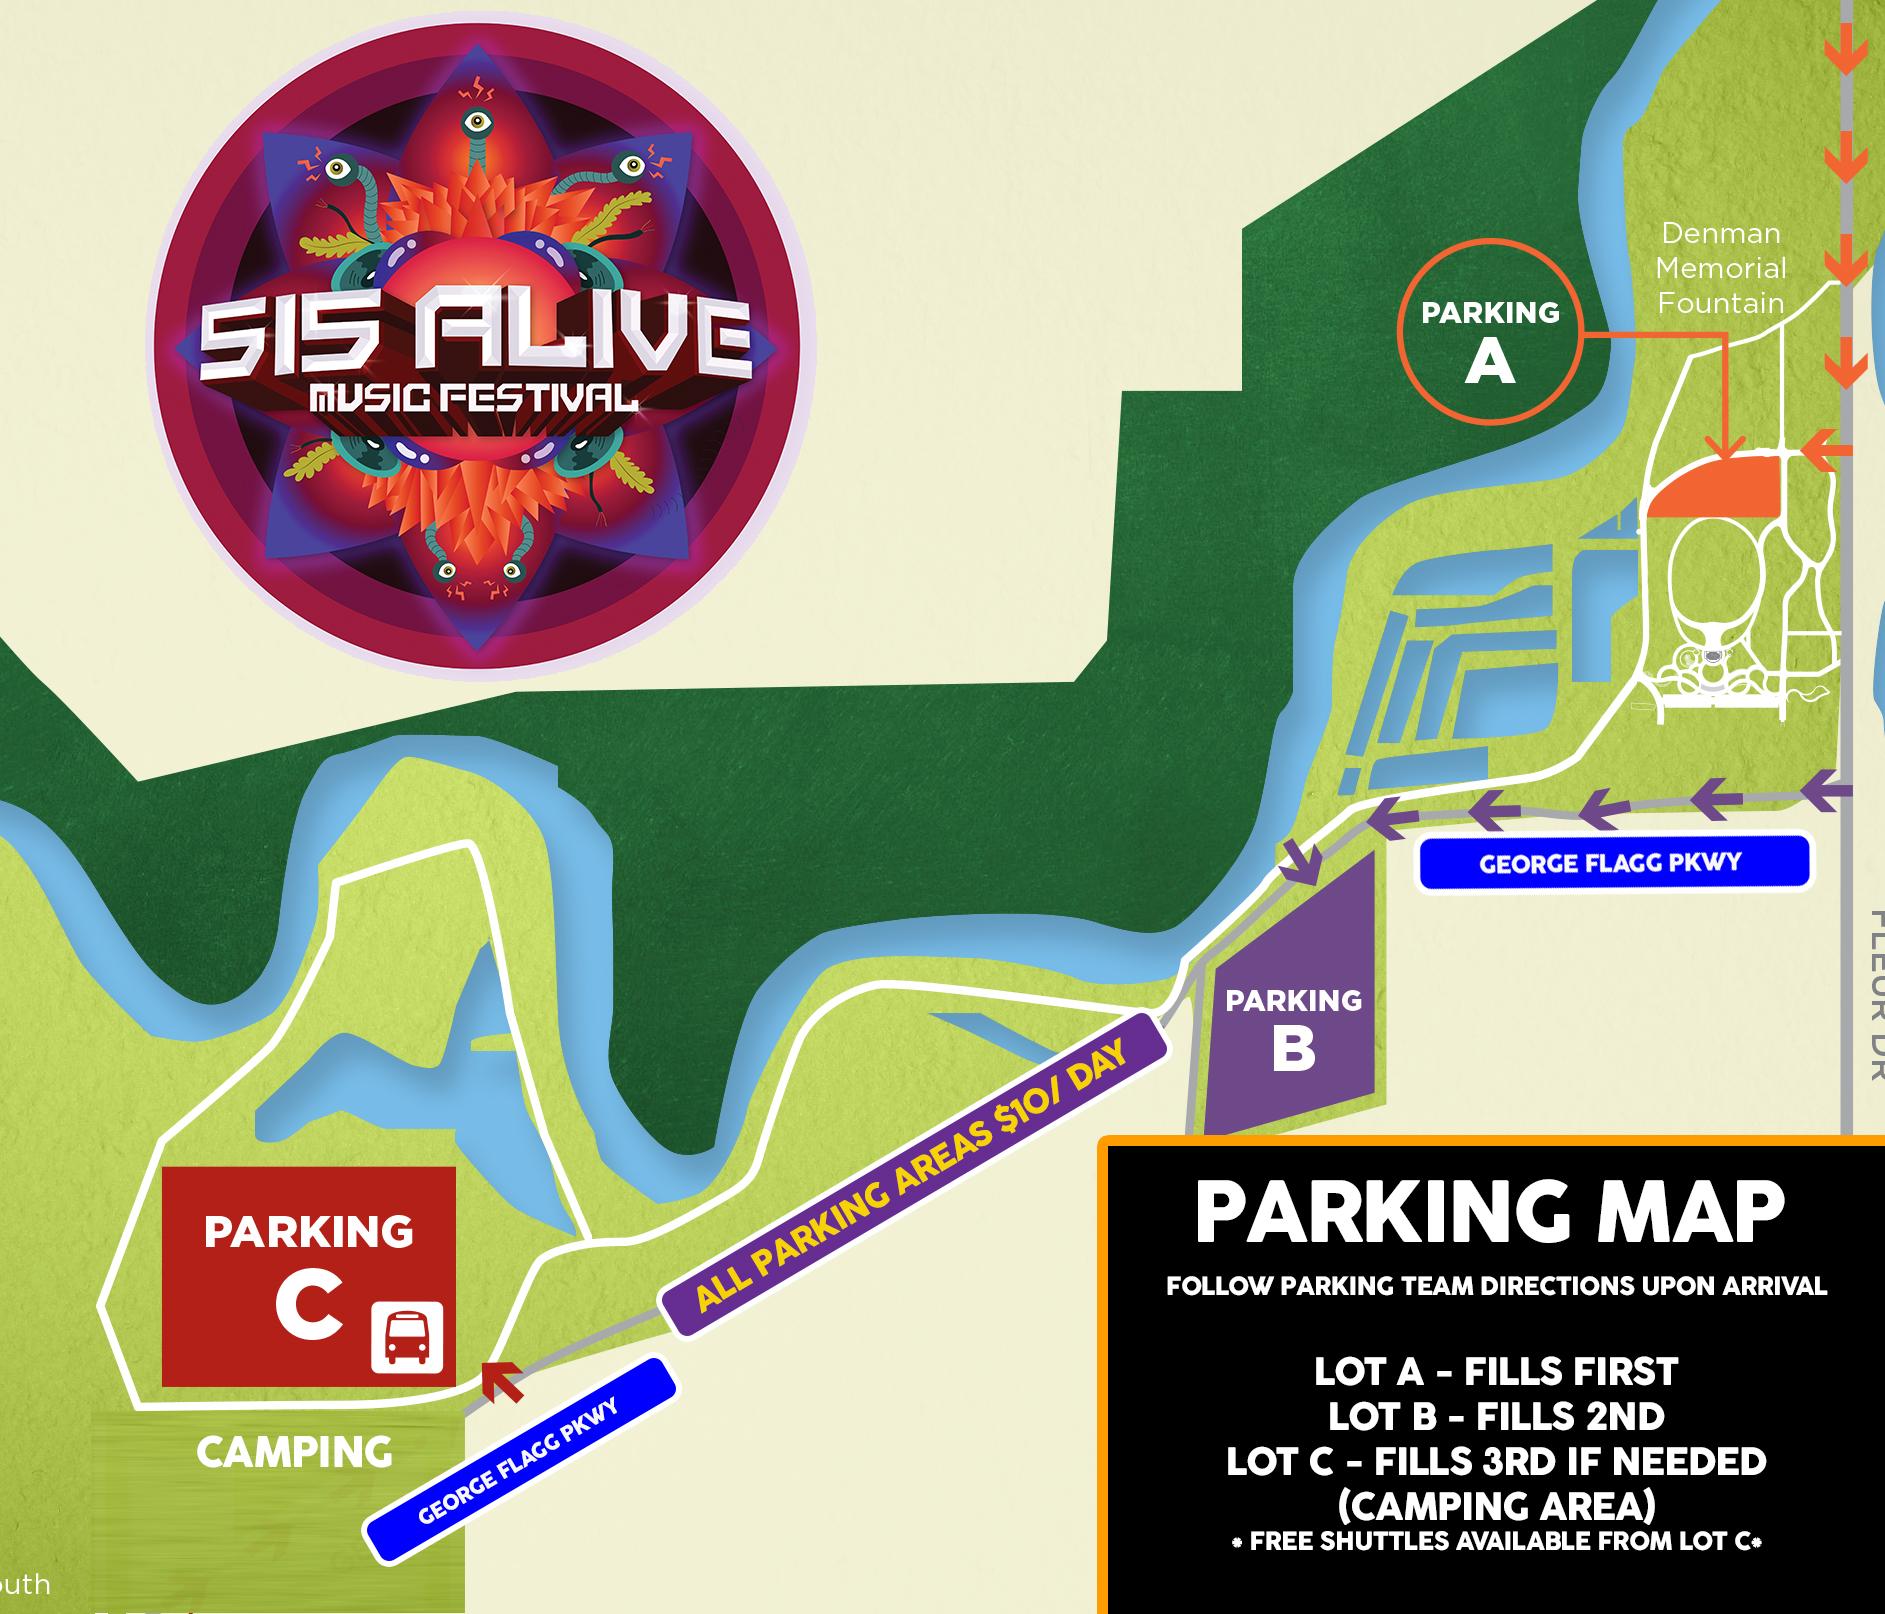 Parking Map 515 2019.jpg